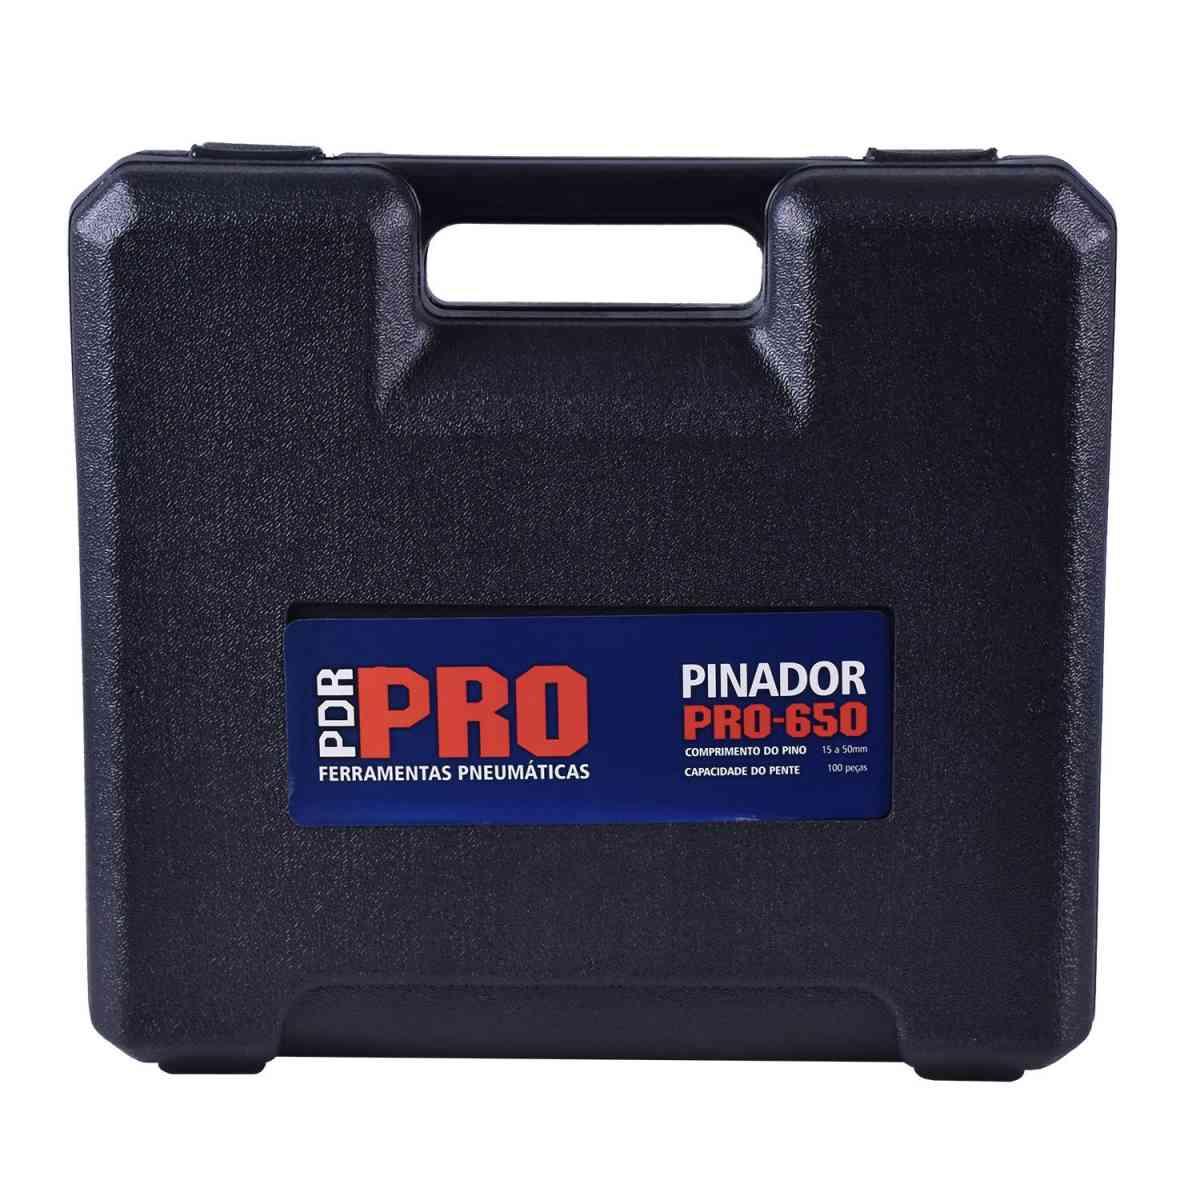 PINADOR PRO-650 PDR PRO